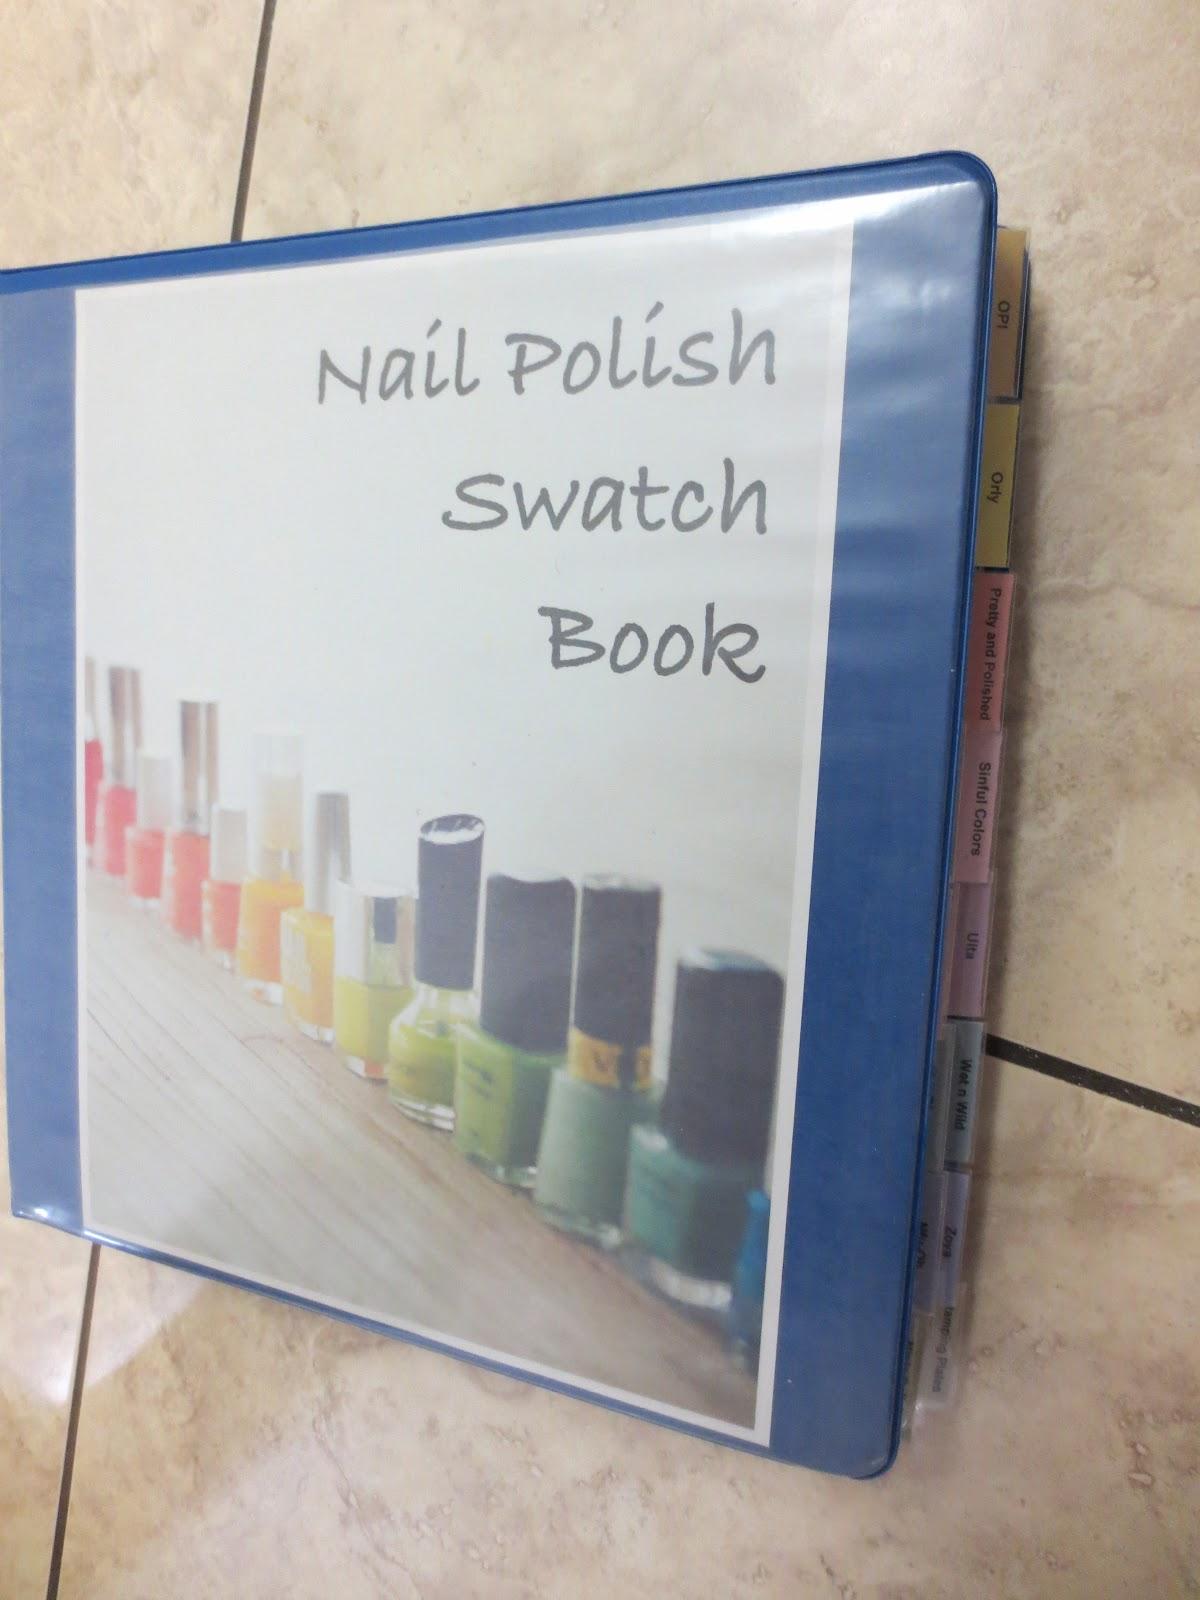 Polish puppies nail polish swatch book nail polish swatch book solutioingenieria Choice Image